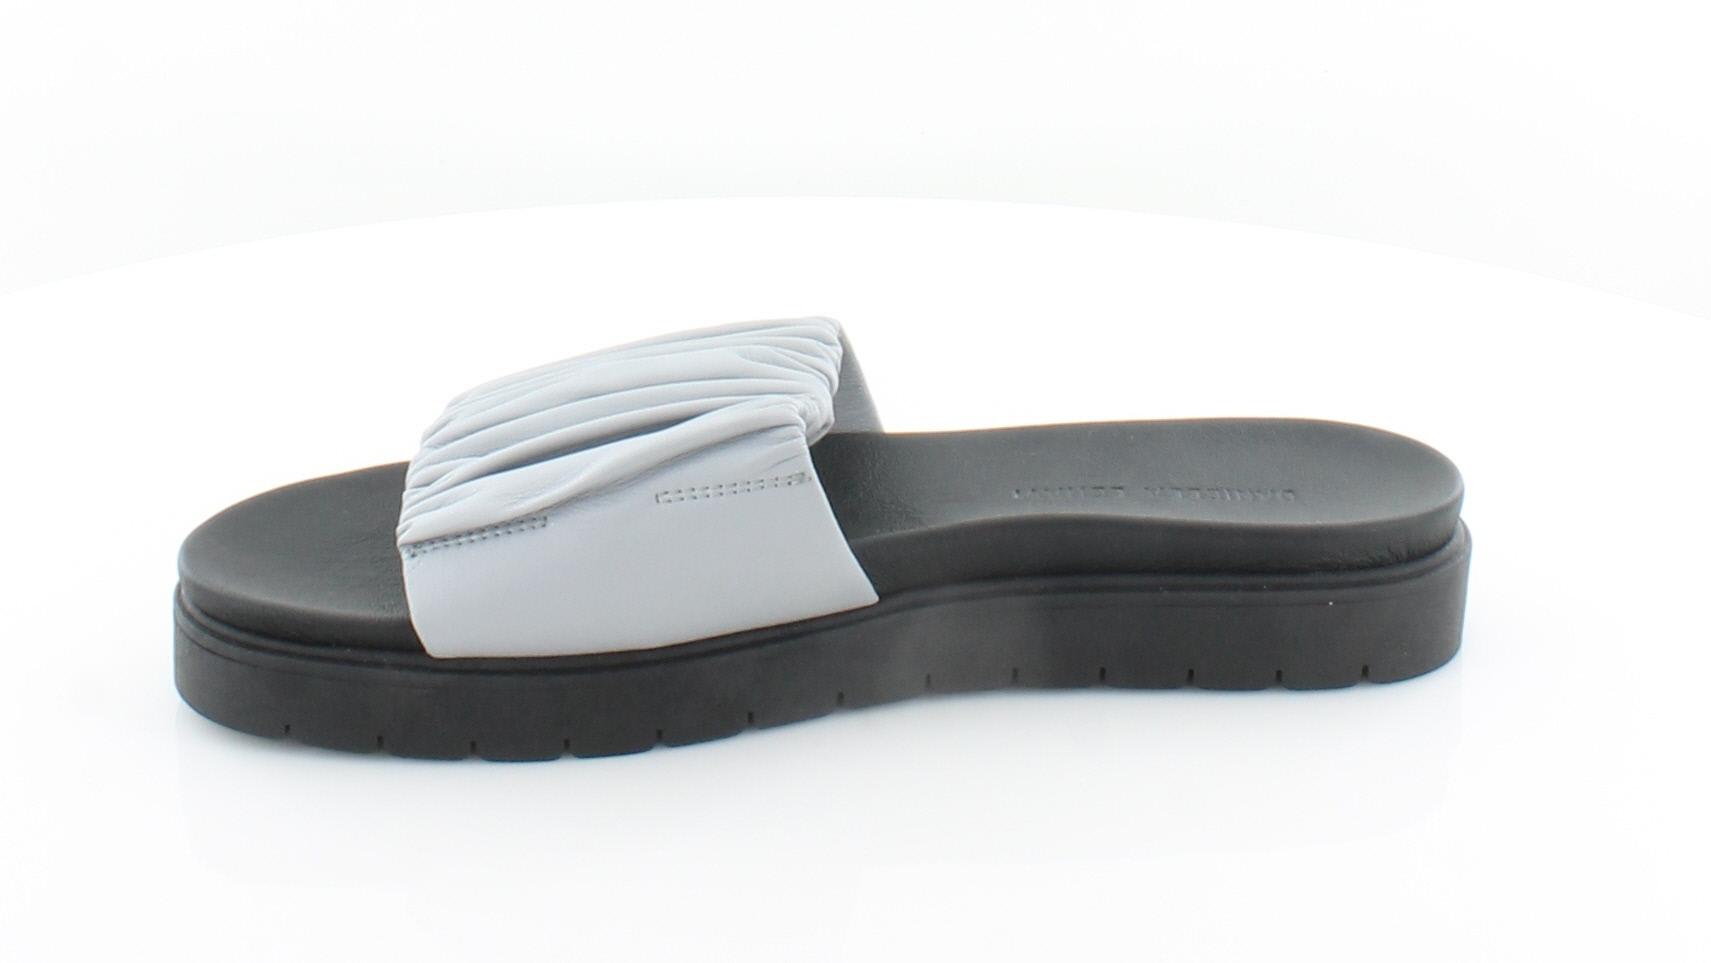 Daniella Lehavi New Sahara Soft bianca donna scarpe Dimensione 10 10 10 M Sandals MSRP  240 7cd394